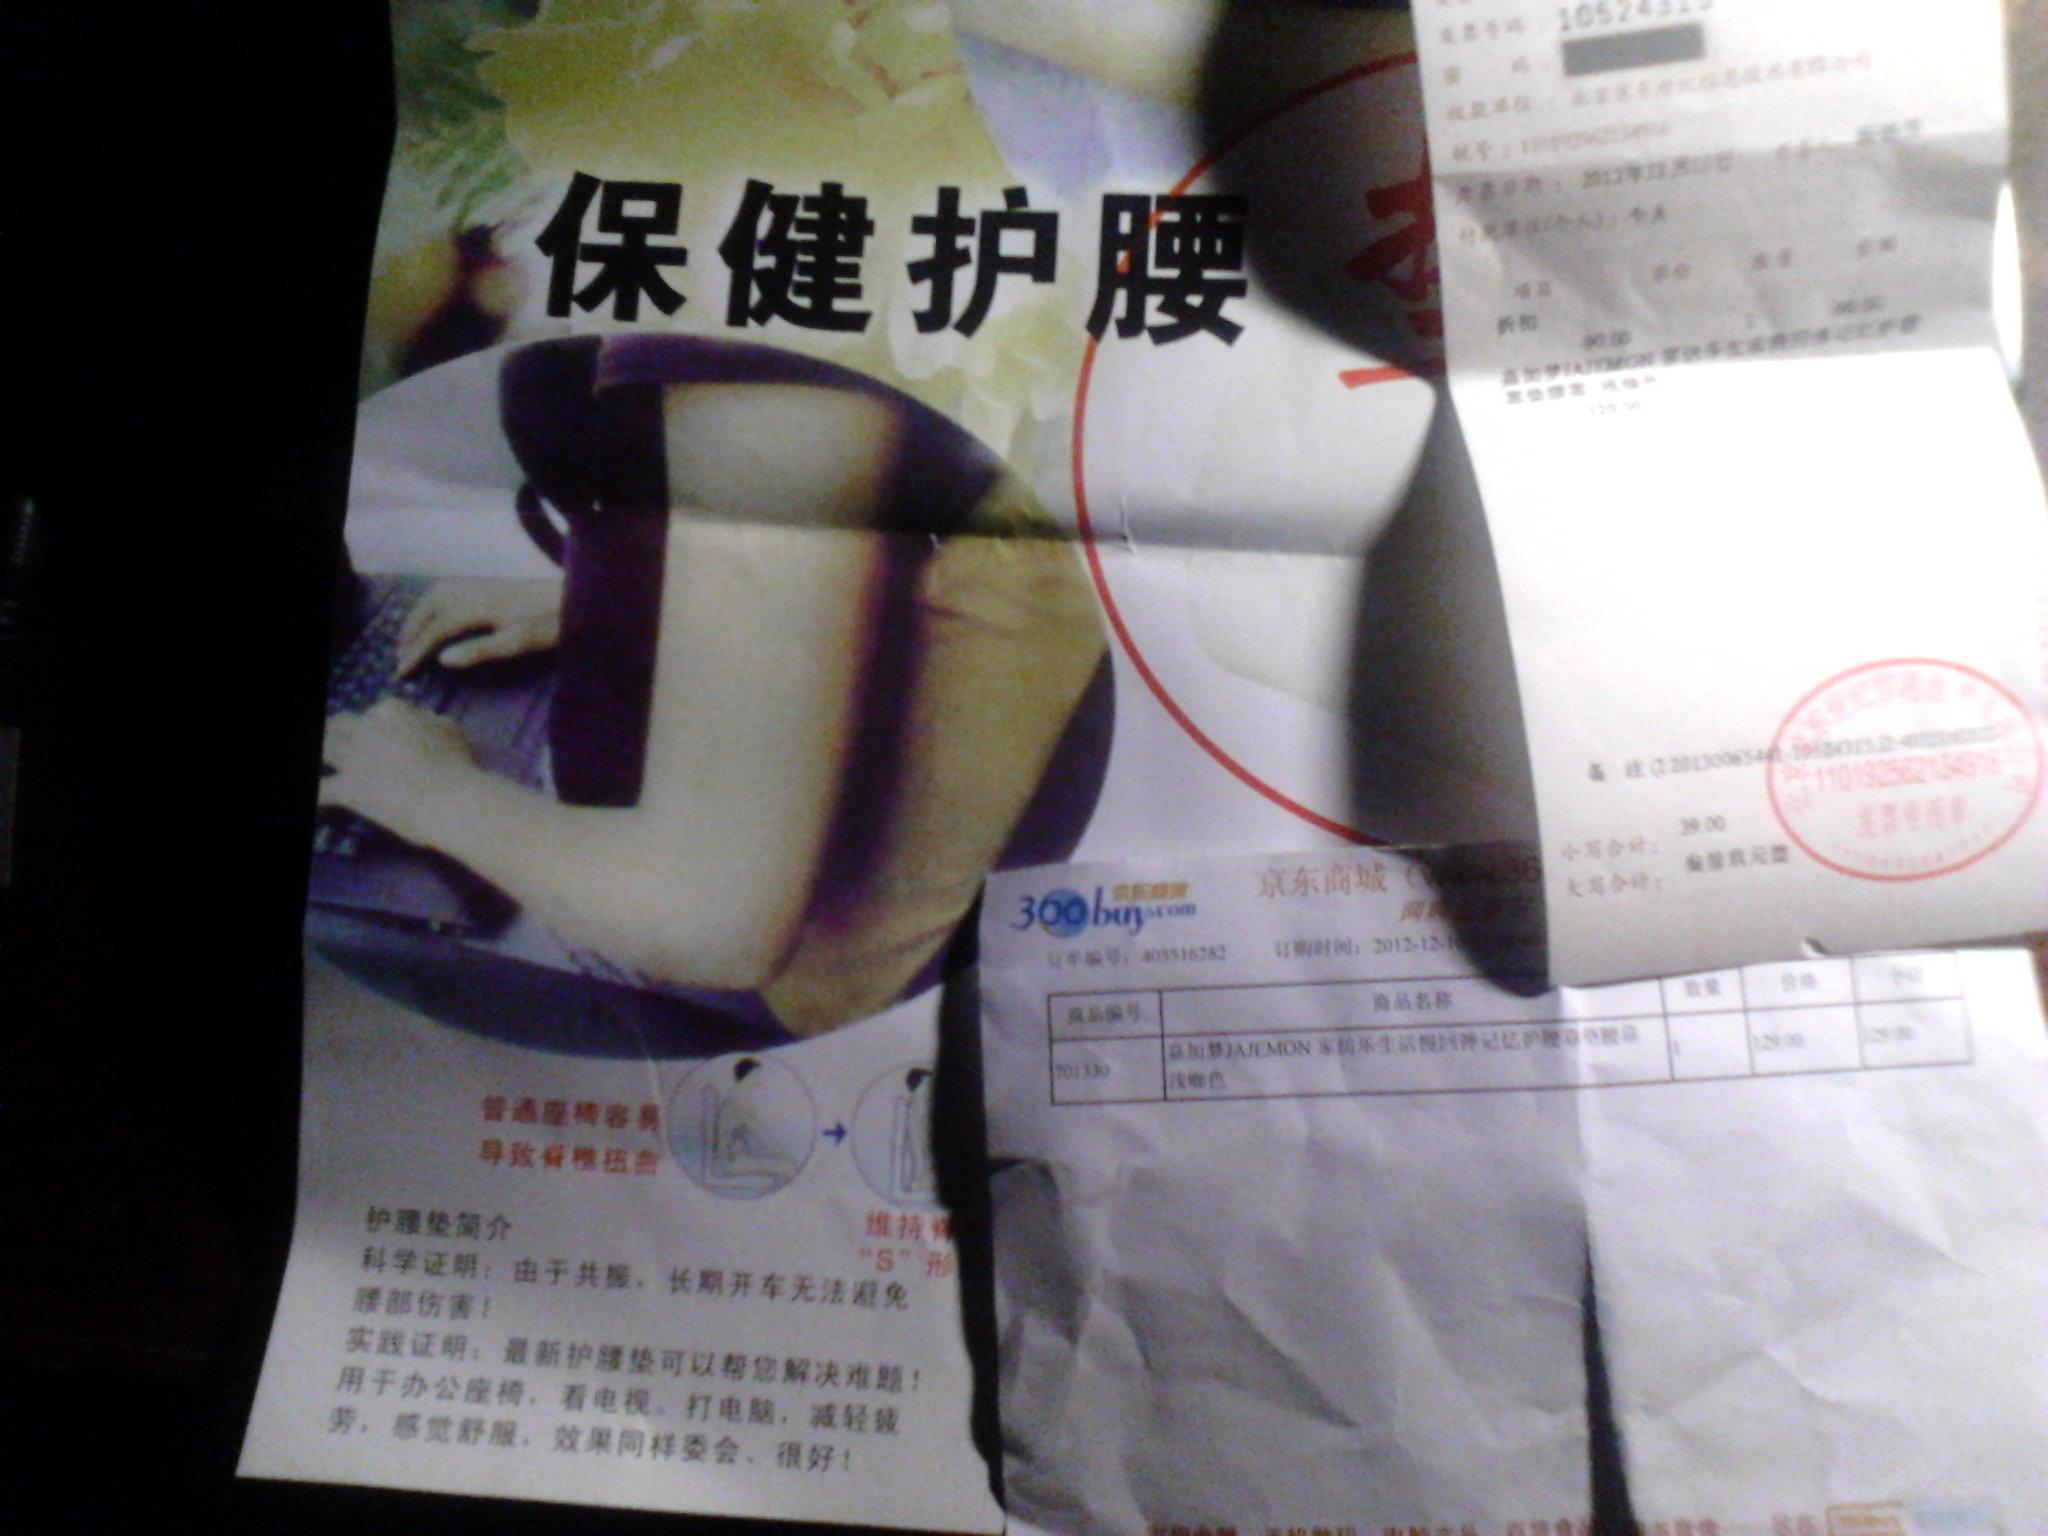 alexander wang bag 00231727 outletonlineshop